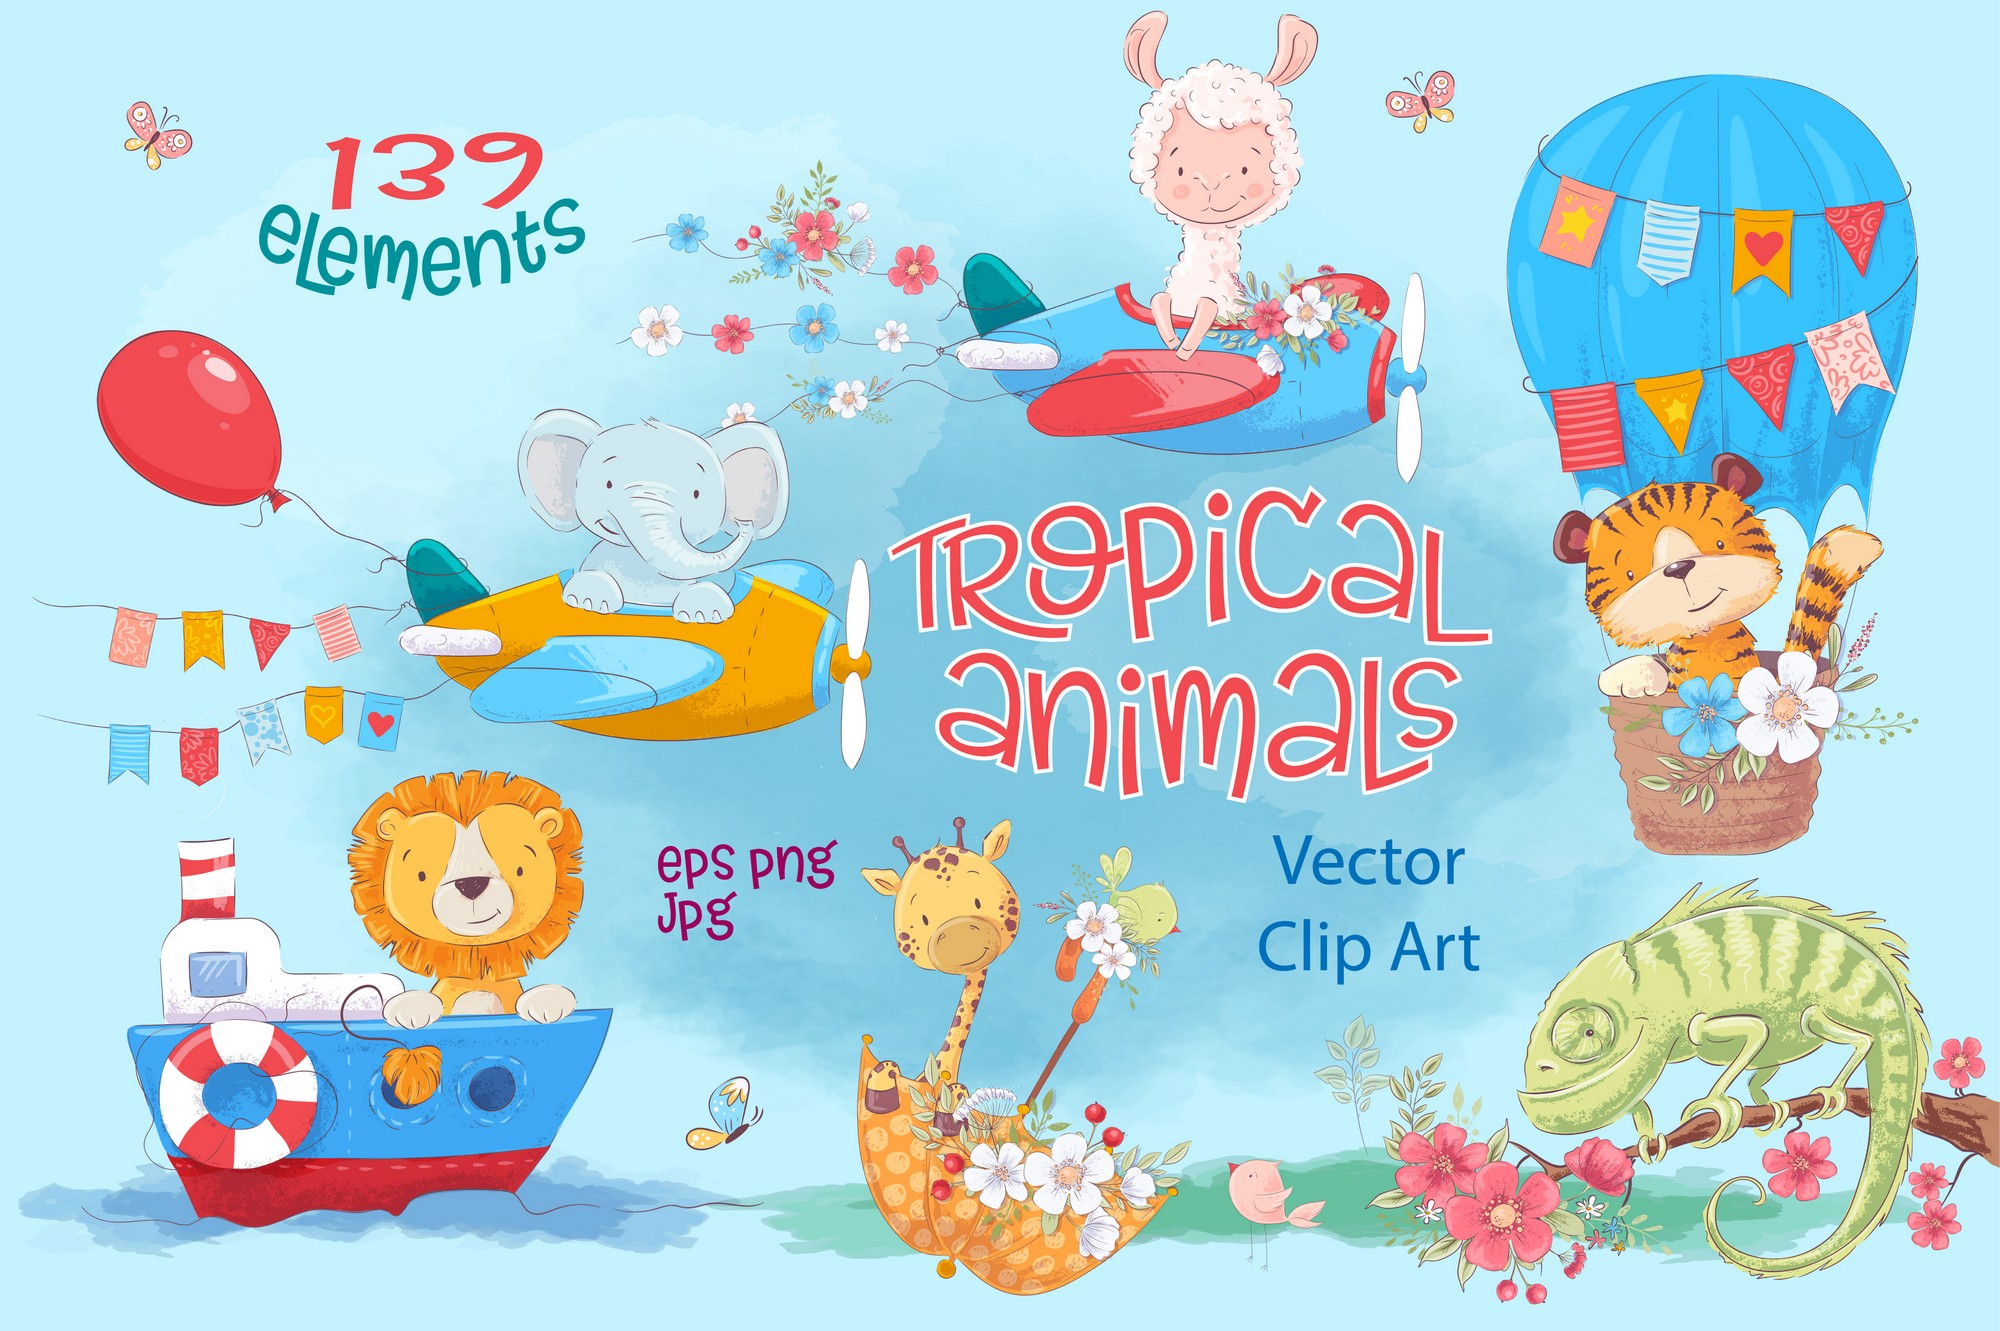 Tropical animals vector clip art example image 1